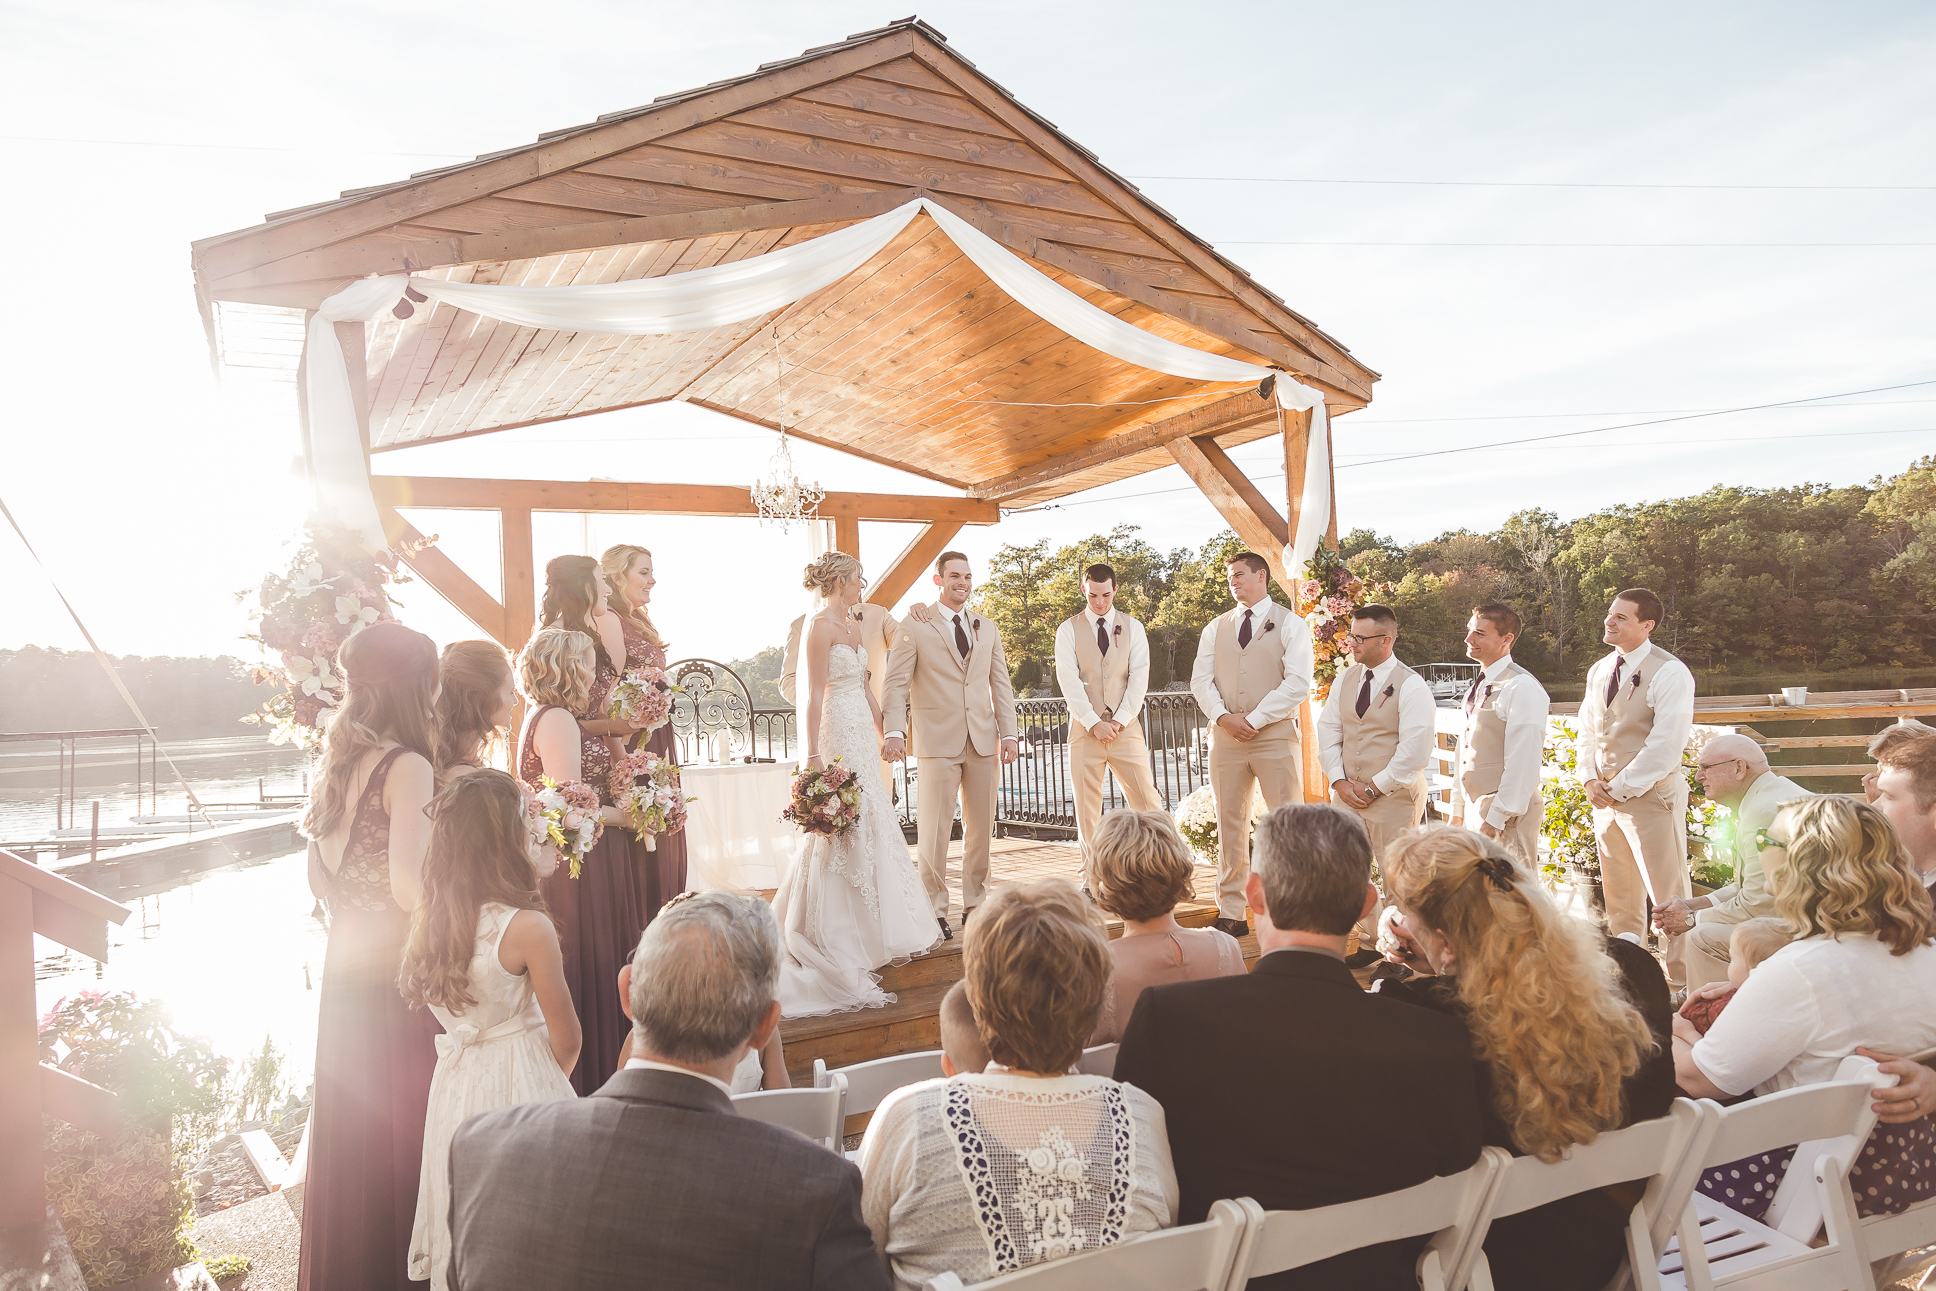 Southern Illinois Wedding Photography - Dustin Morrison Photography - Byrne Wedding-85.jpg